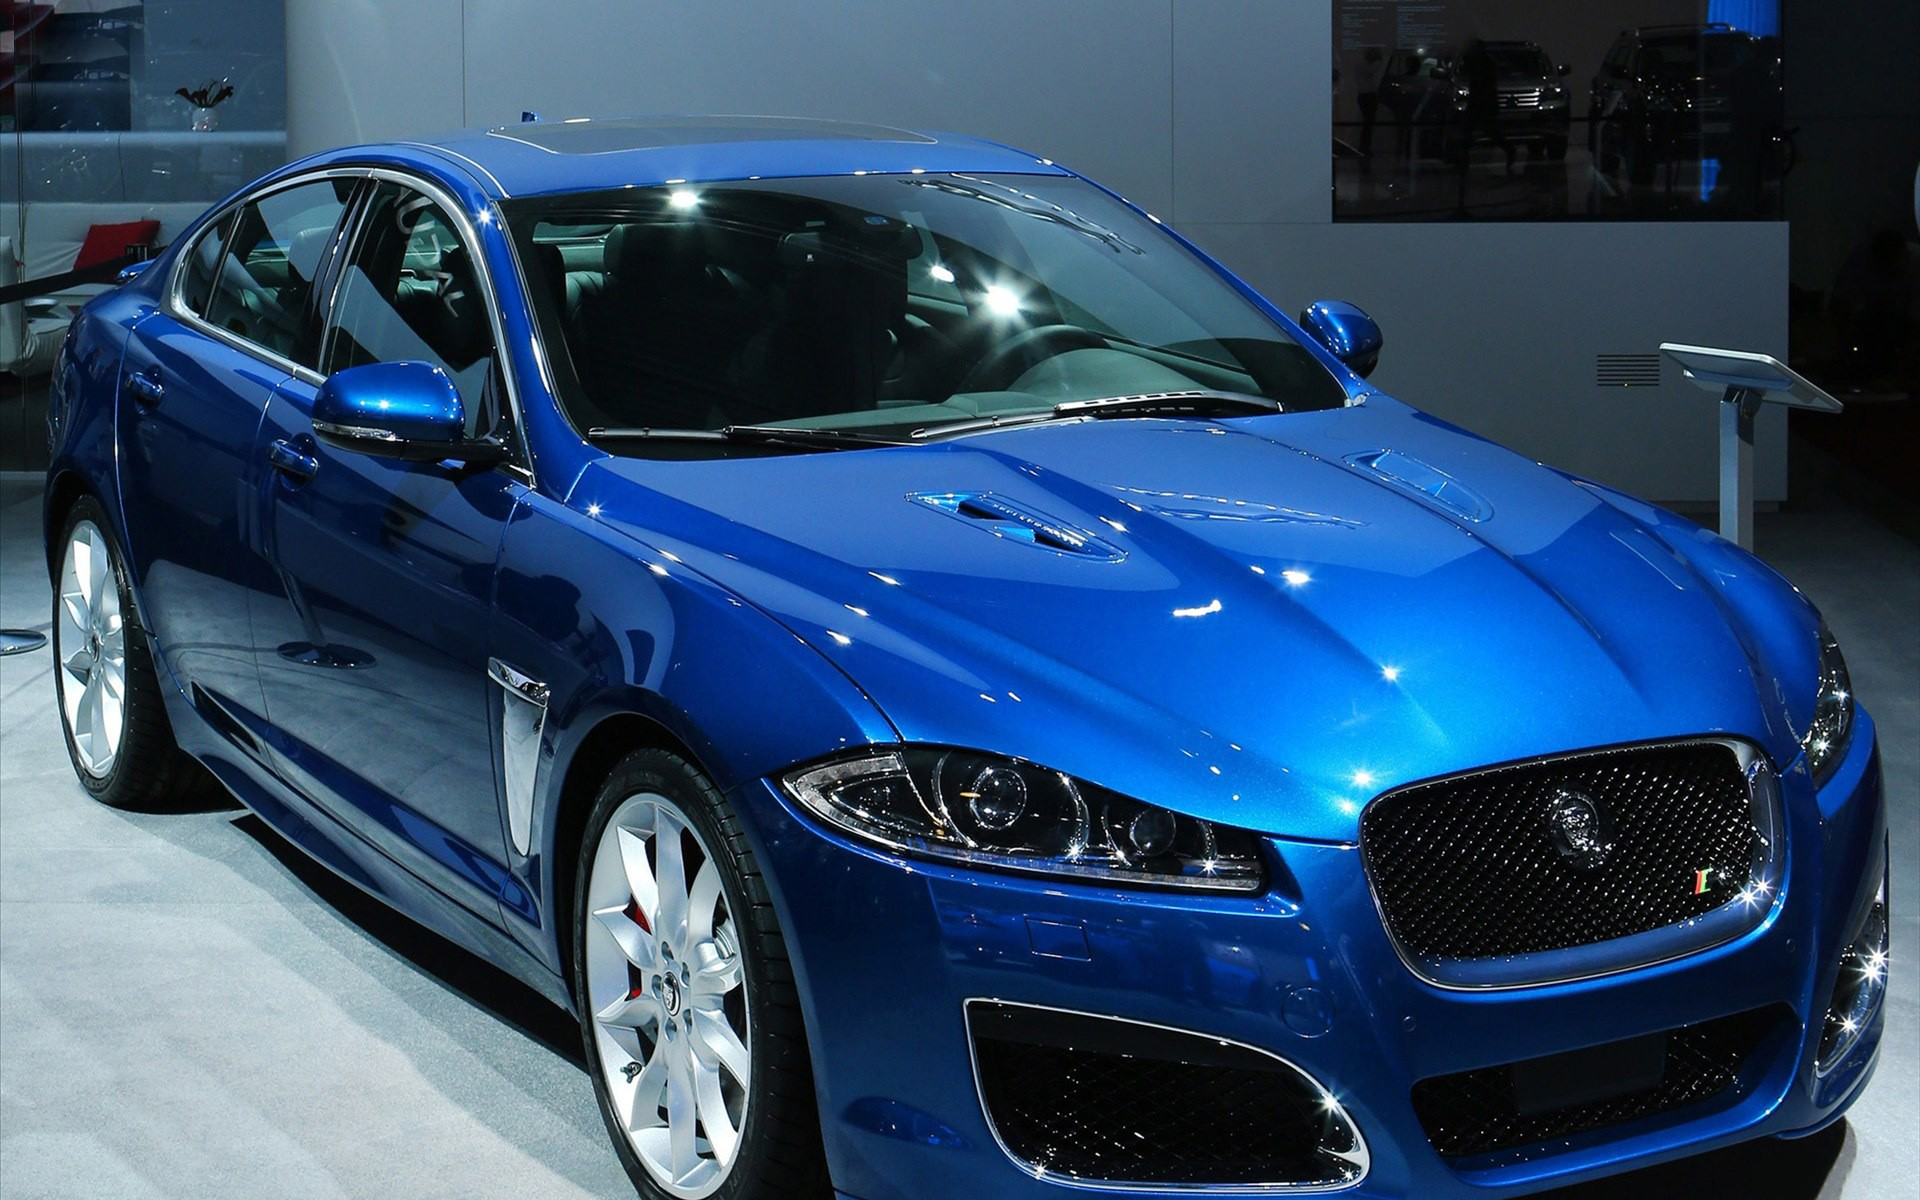 Cars Wallpapers: Jaguar XFR Speed Pack 2013 Wallpaper